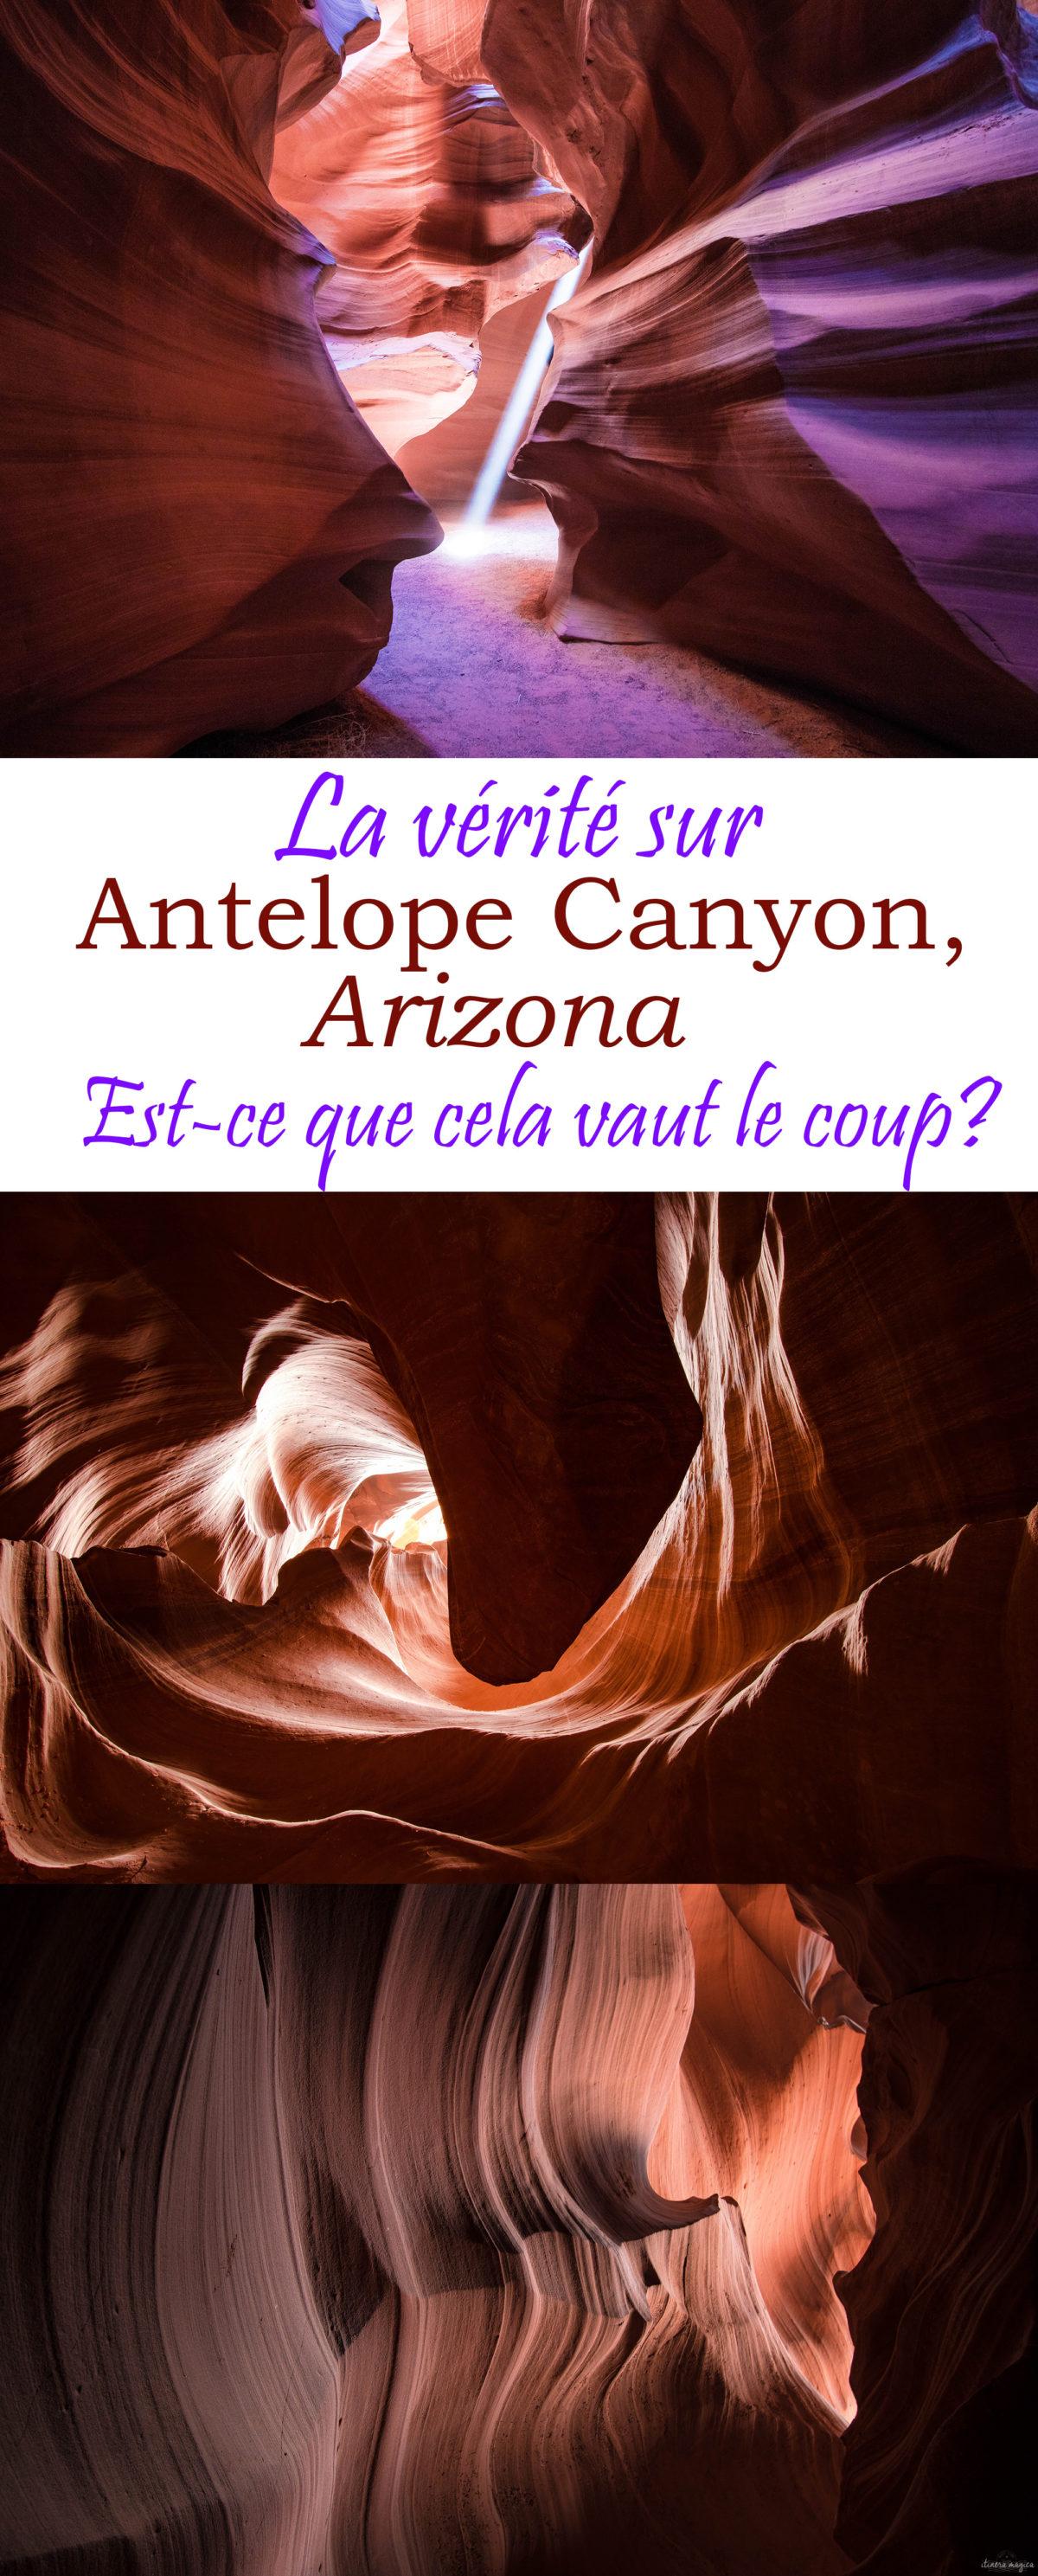 Visiter Antelope Canyon en Arizona : ça vaut le coup ou pas ? Conseils pour visiter et photographier #antelopecanyon. #arizona #usa